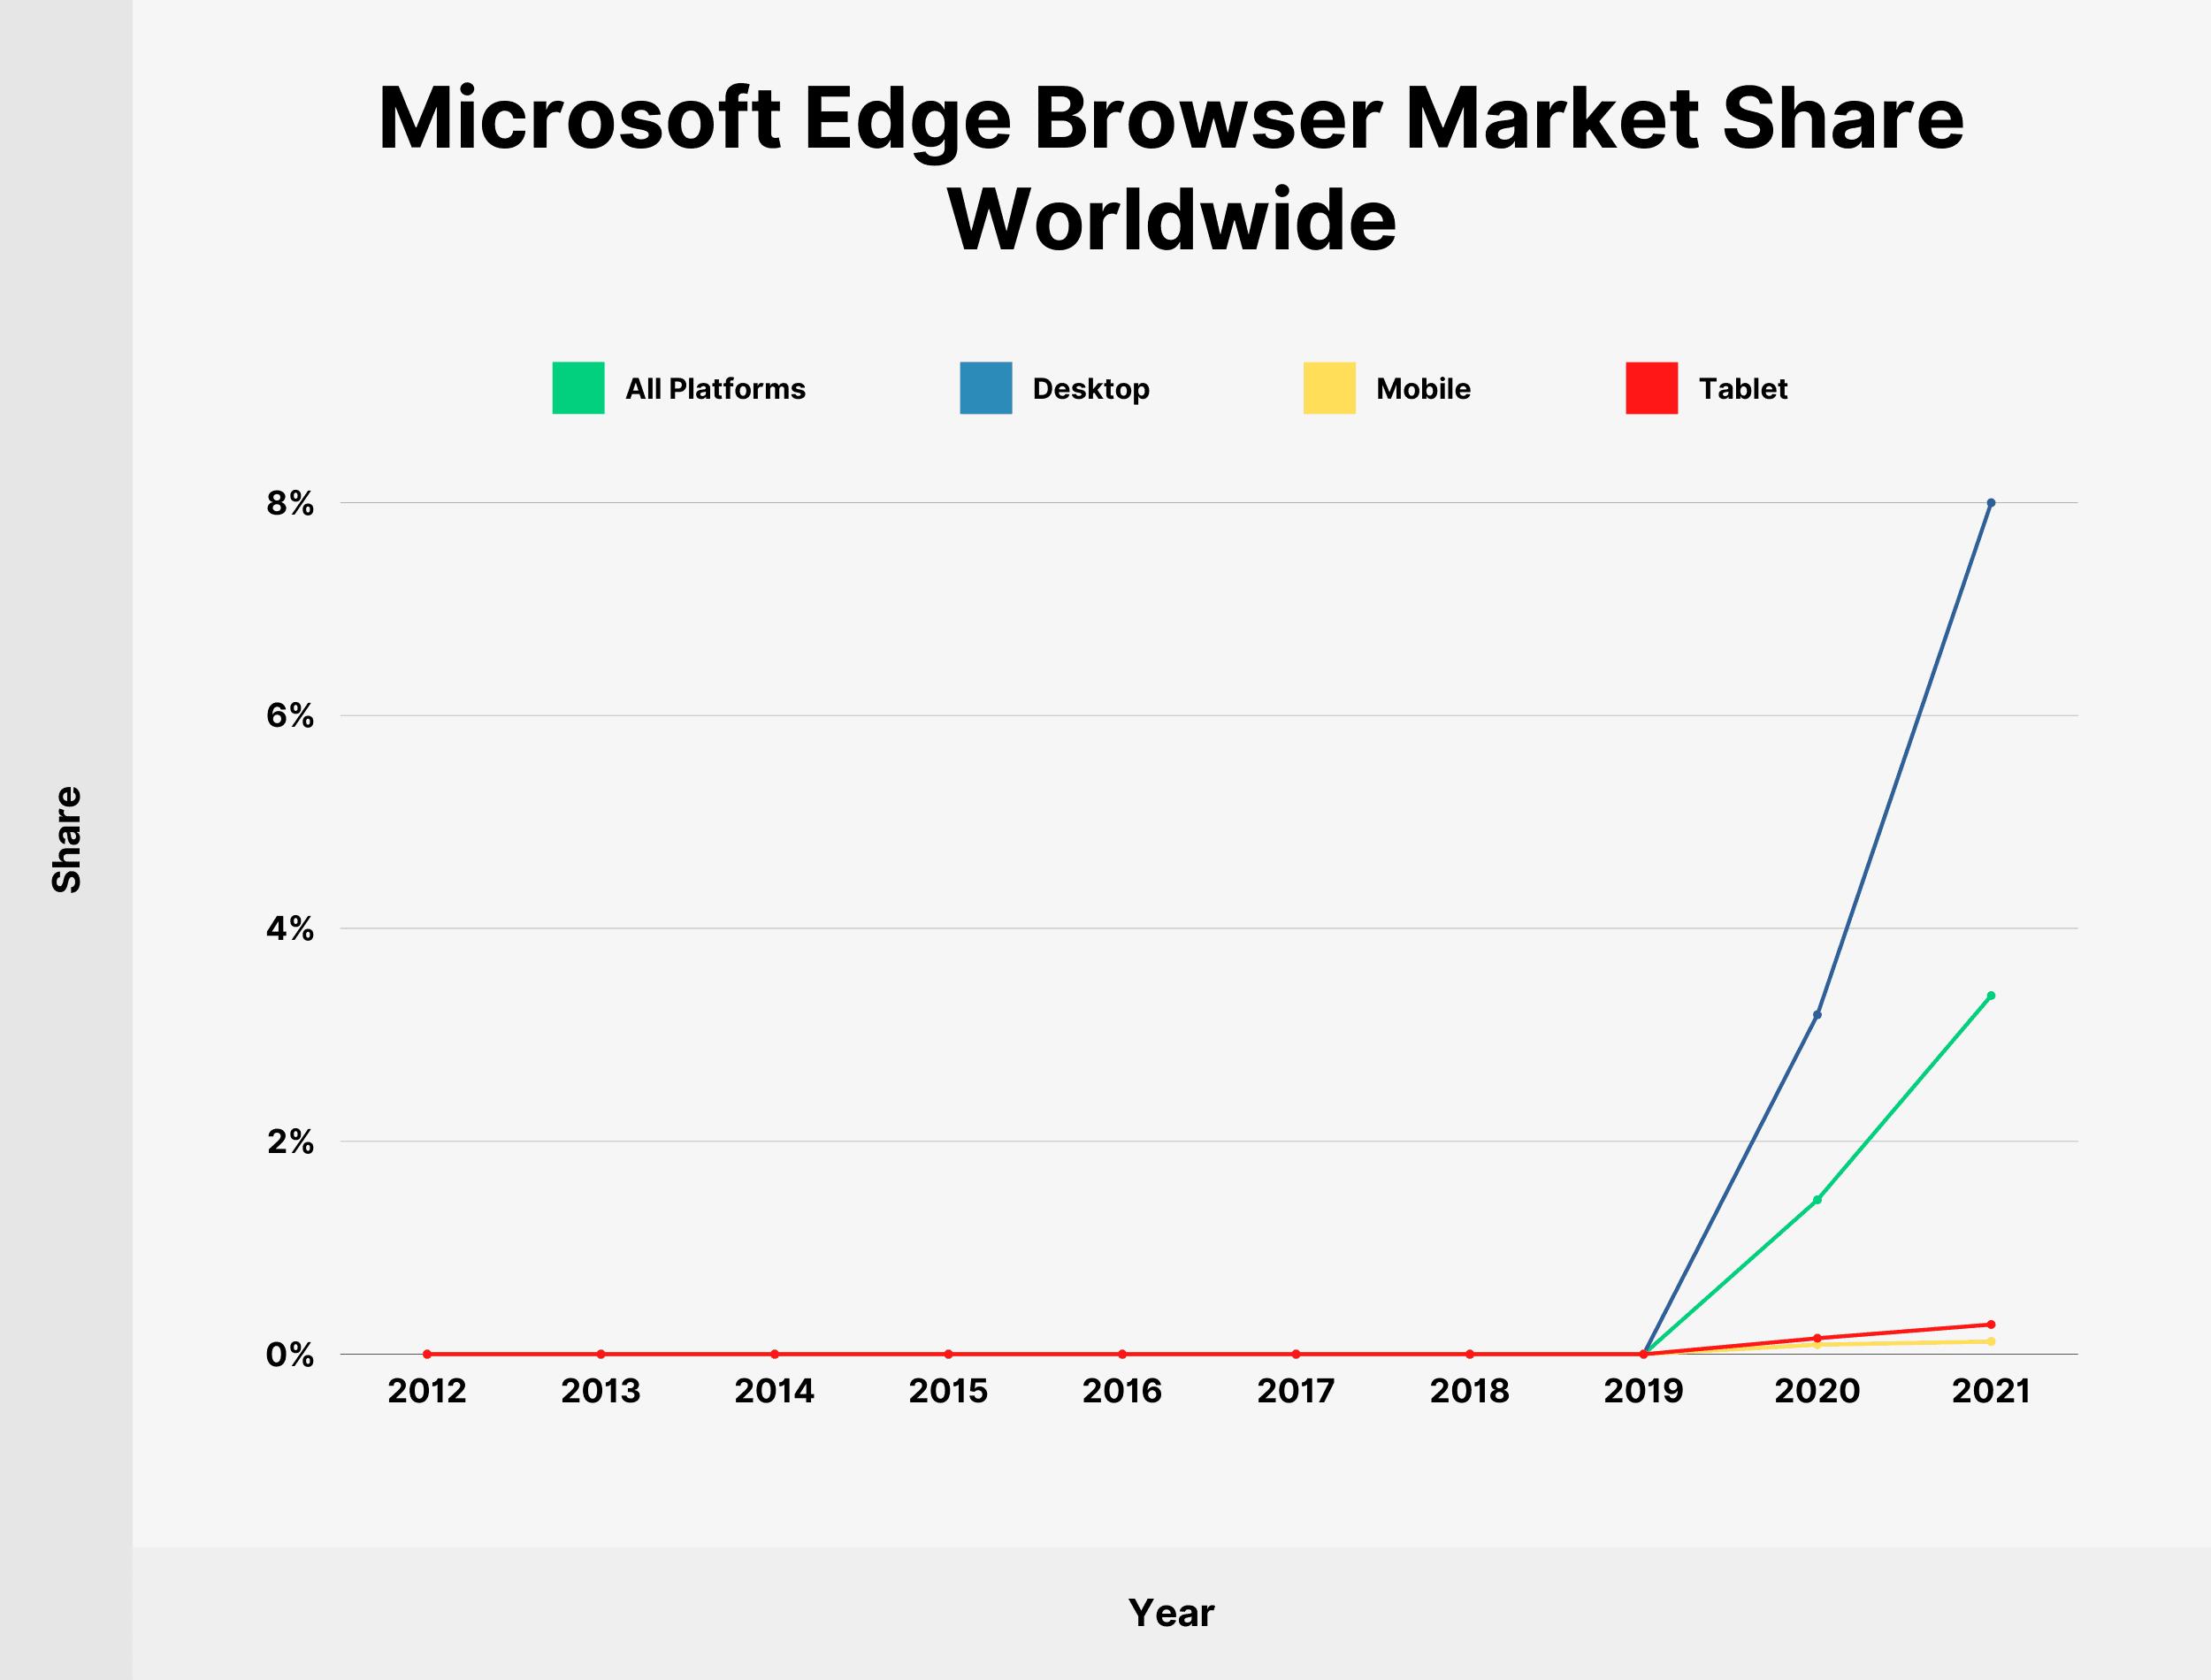 Microsoft Edge Browser Market Share Worldwide